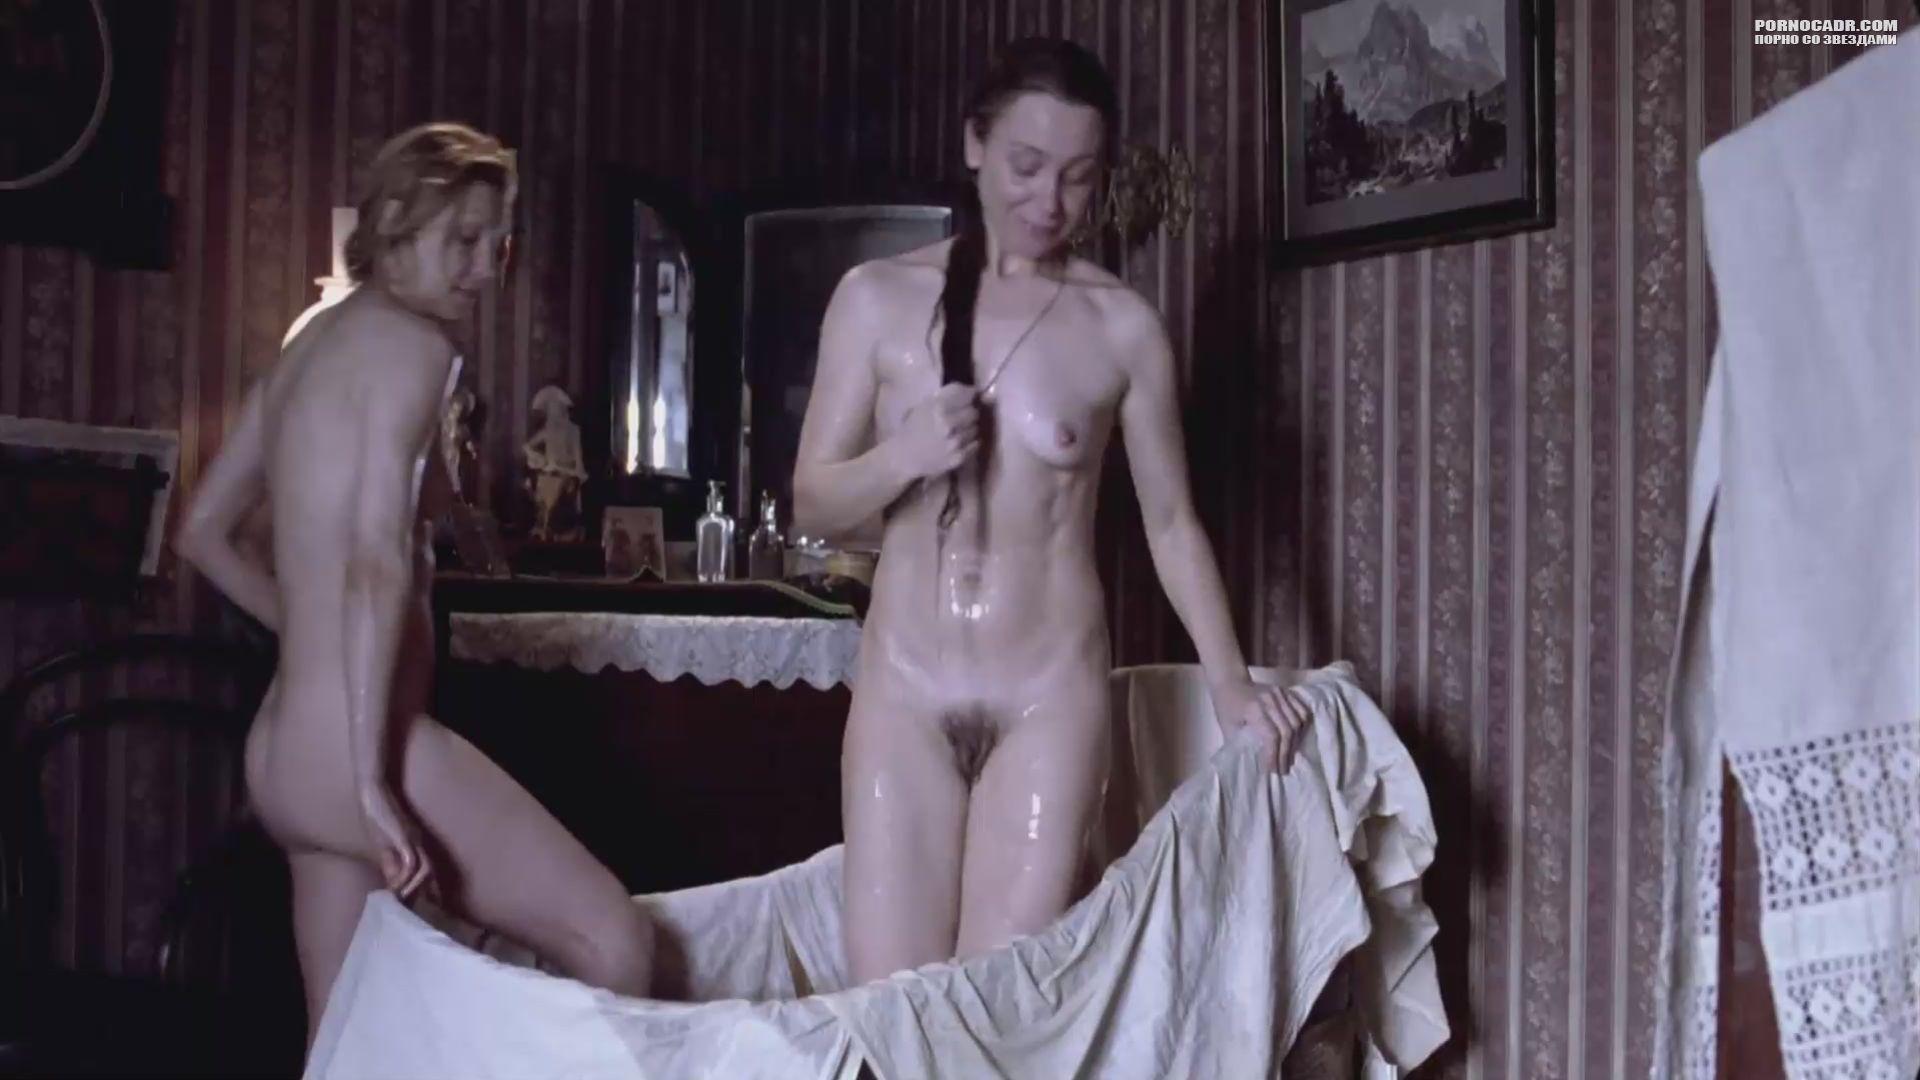 fragmenti-iz-russkih-filmov-porno